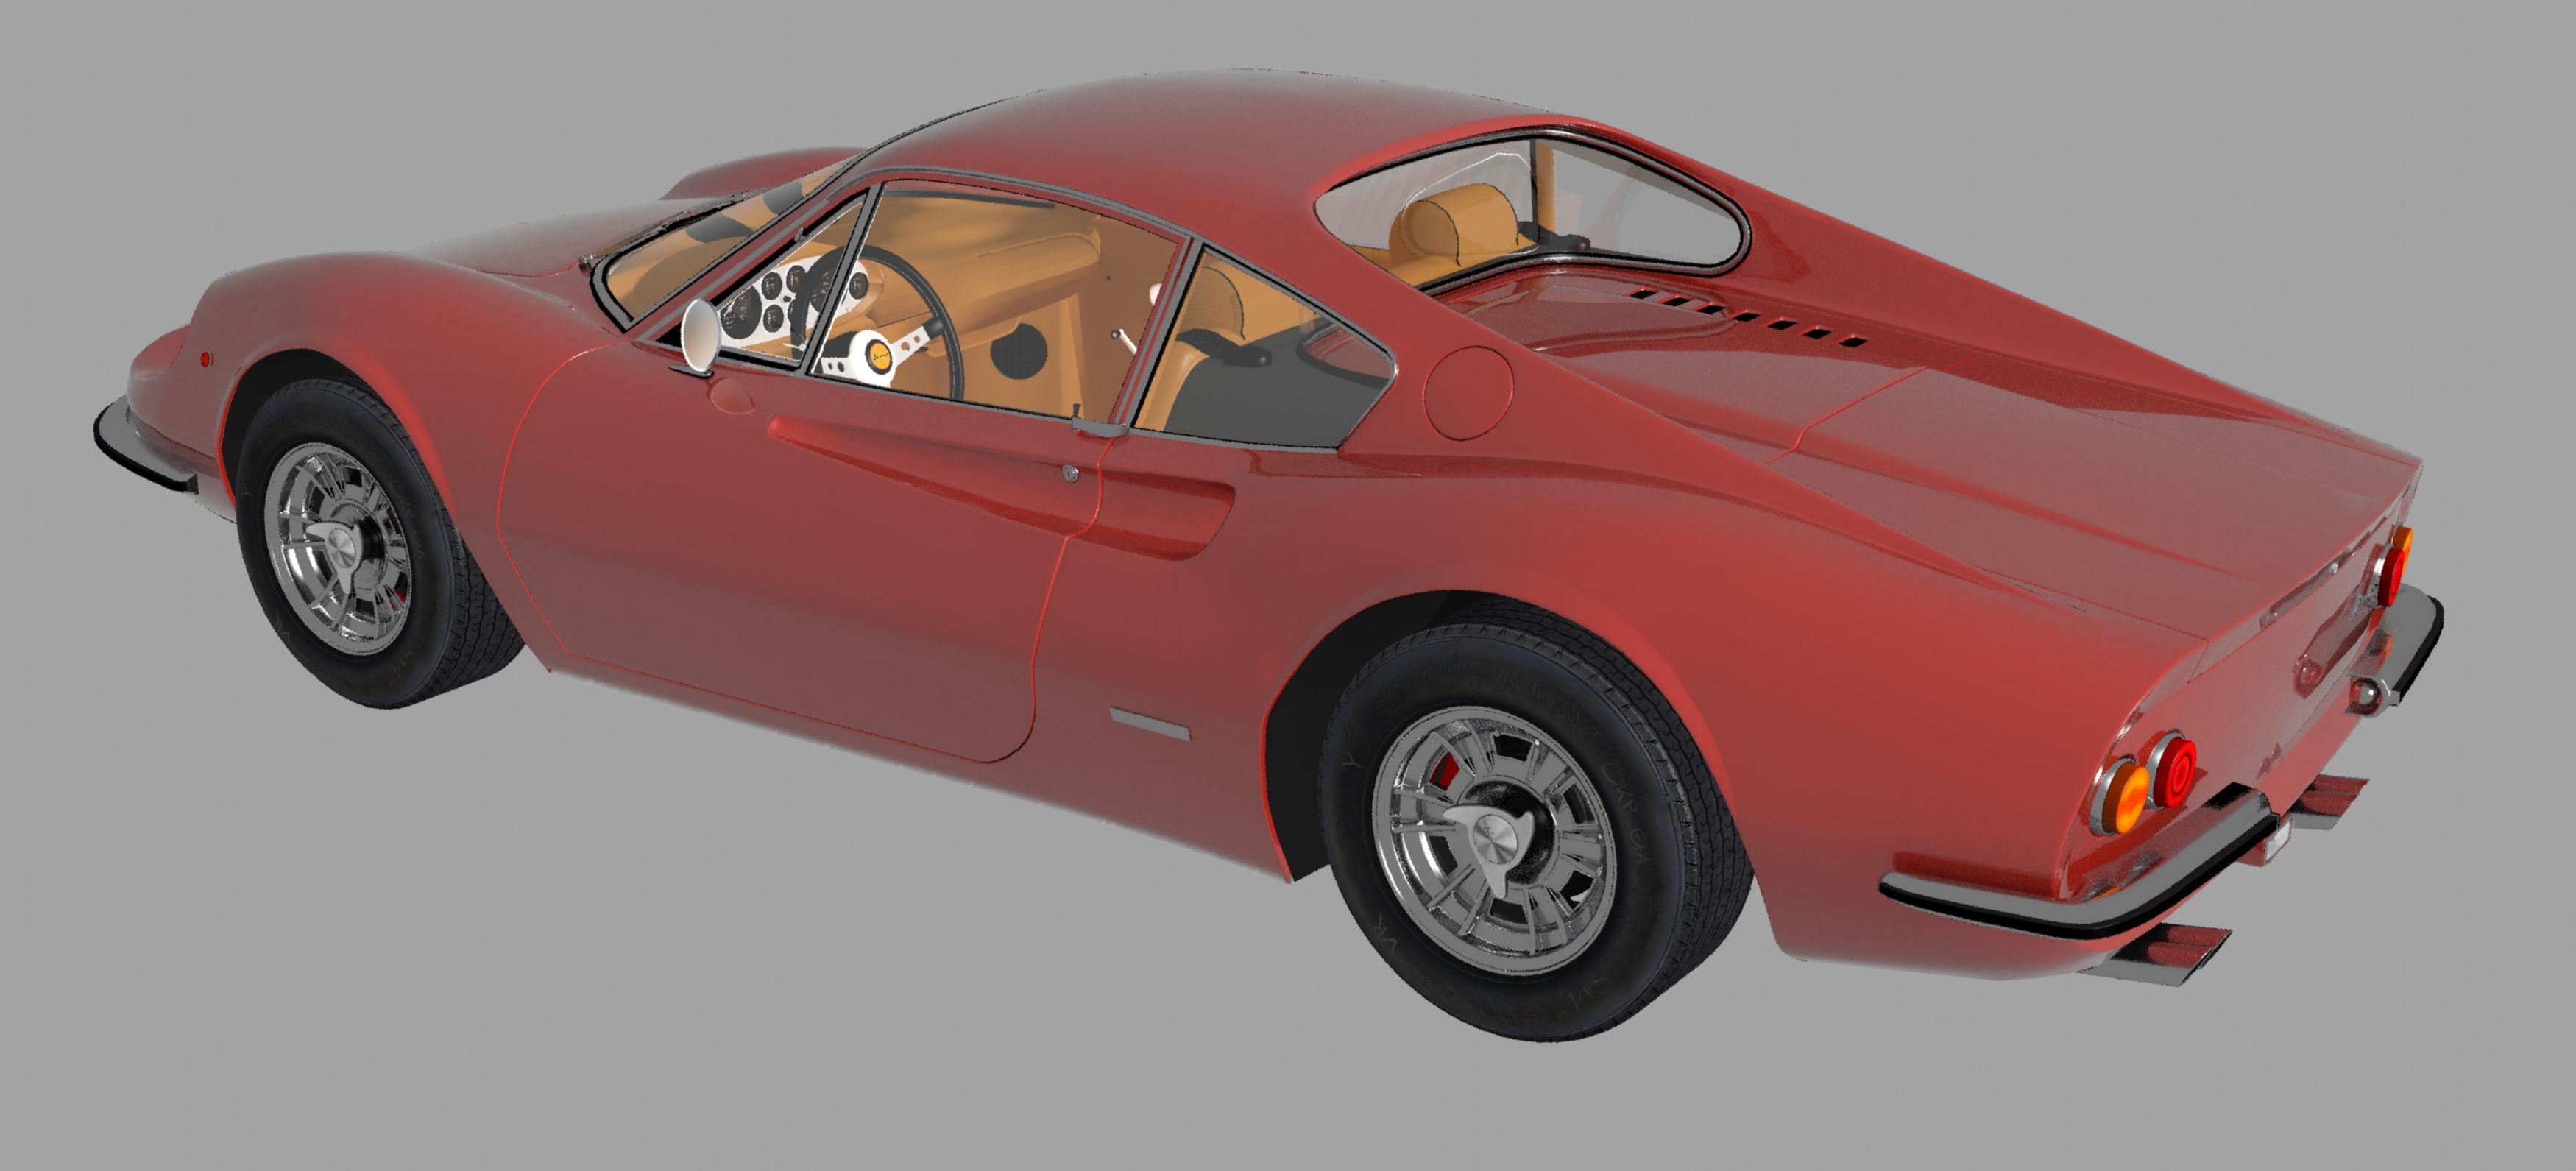 Ferrari-dino-246gt-2-3500-3500